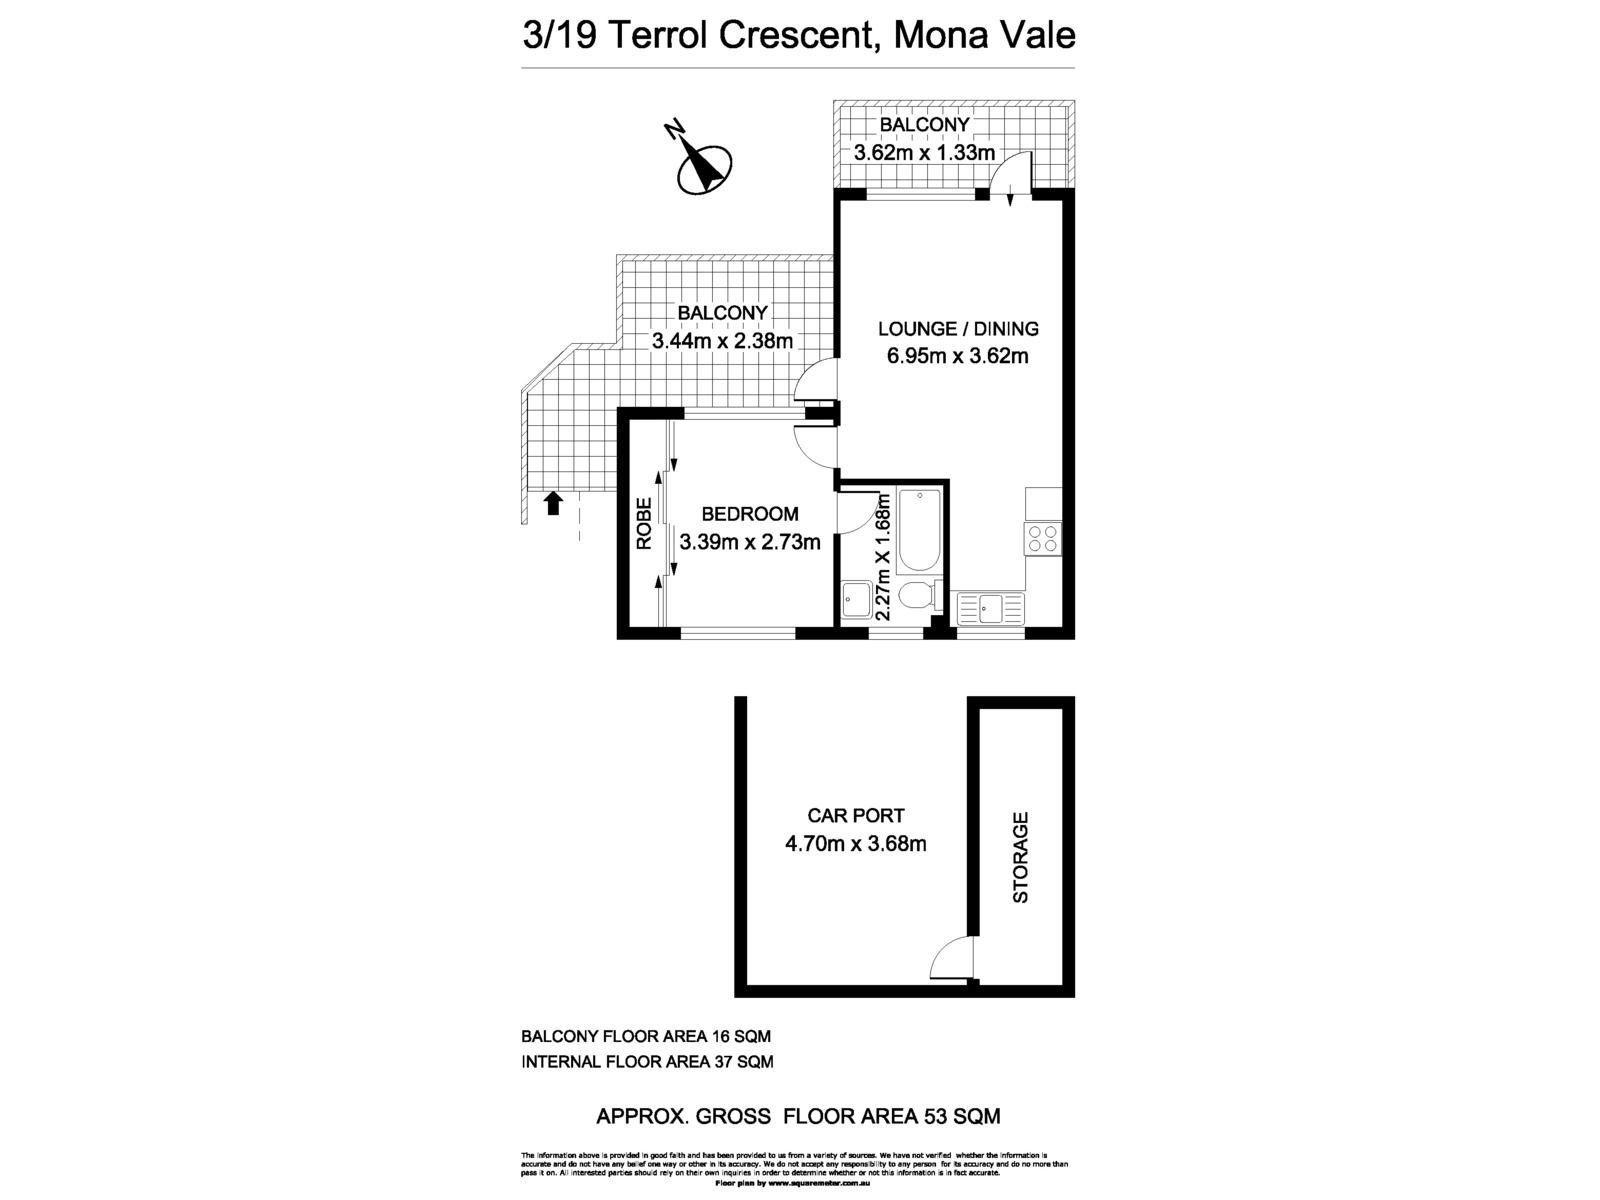 3 / 19 Terrol Crescent, Mona Vale